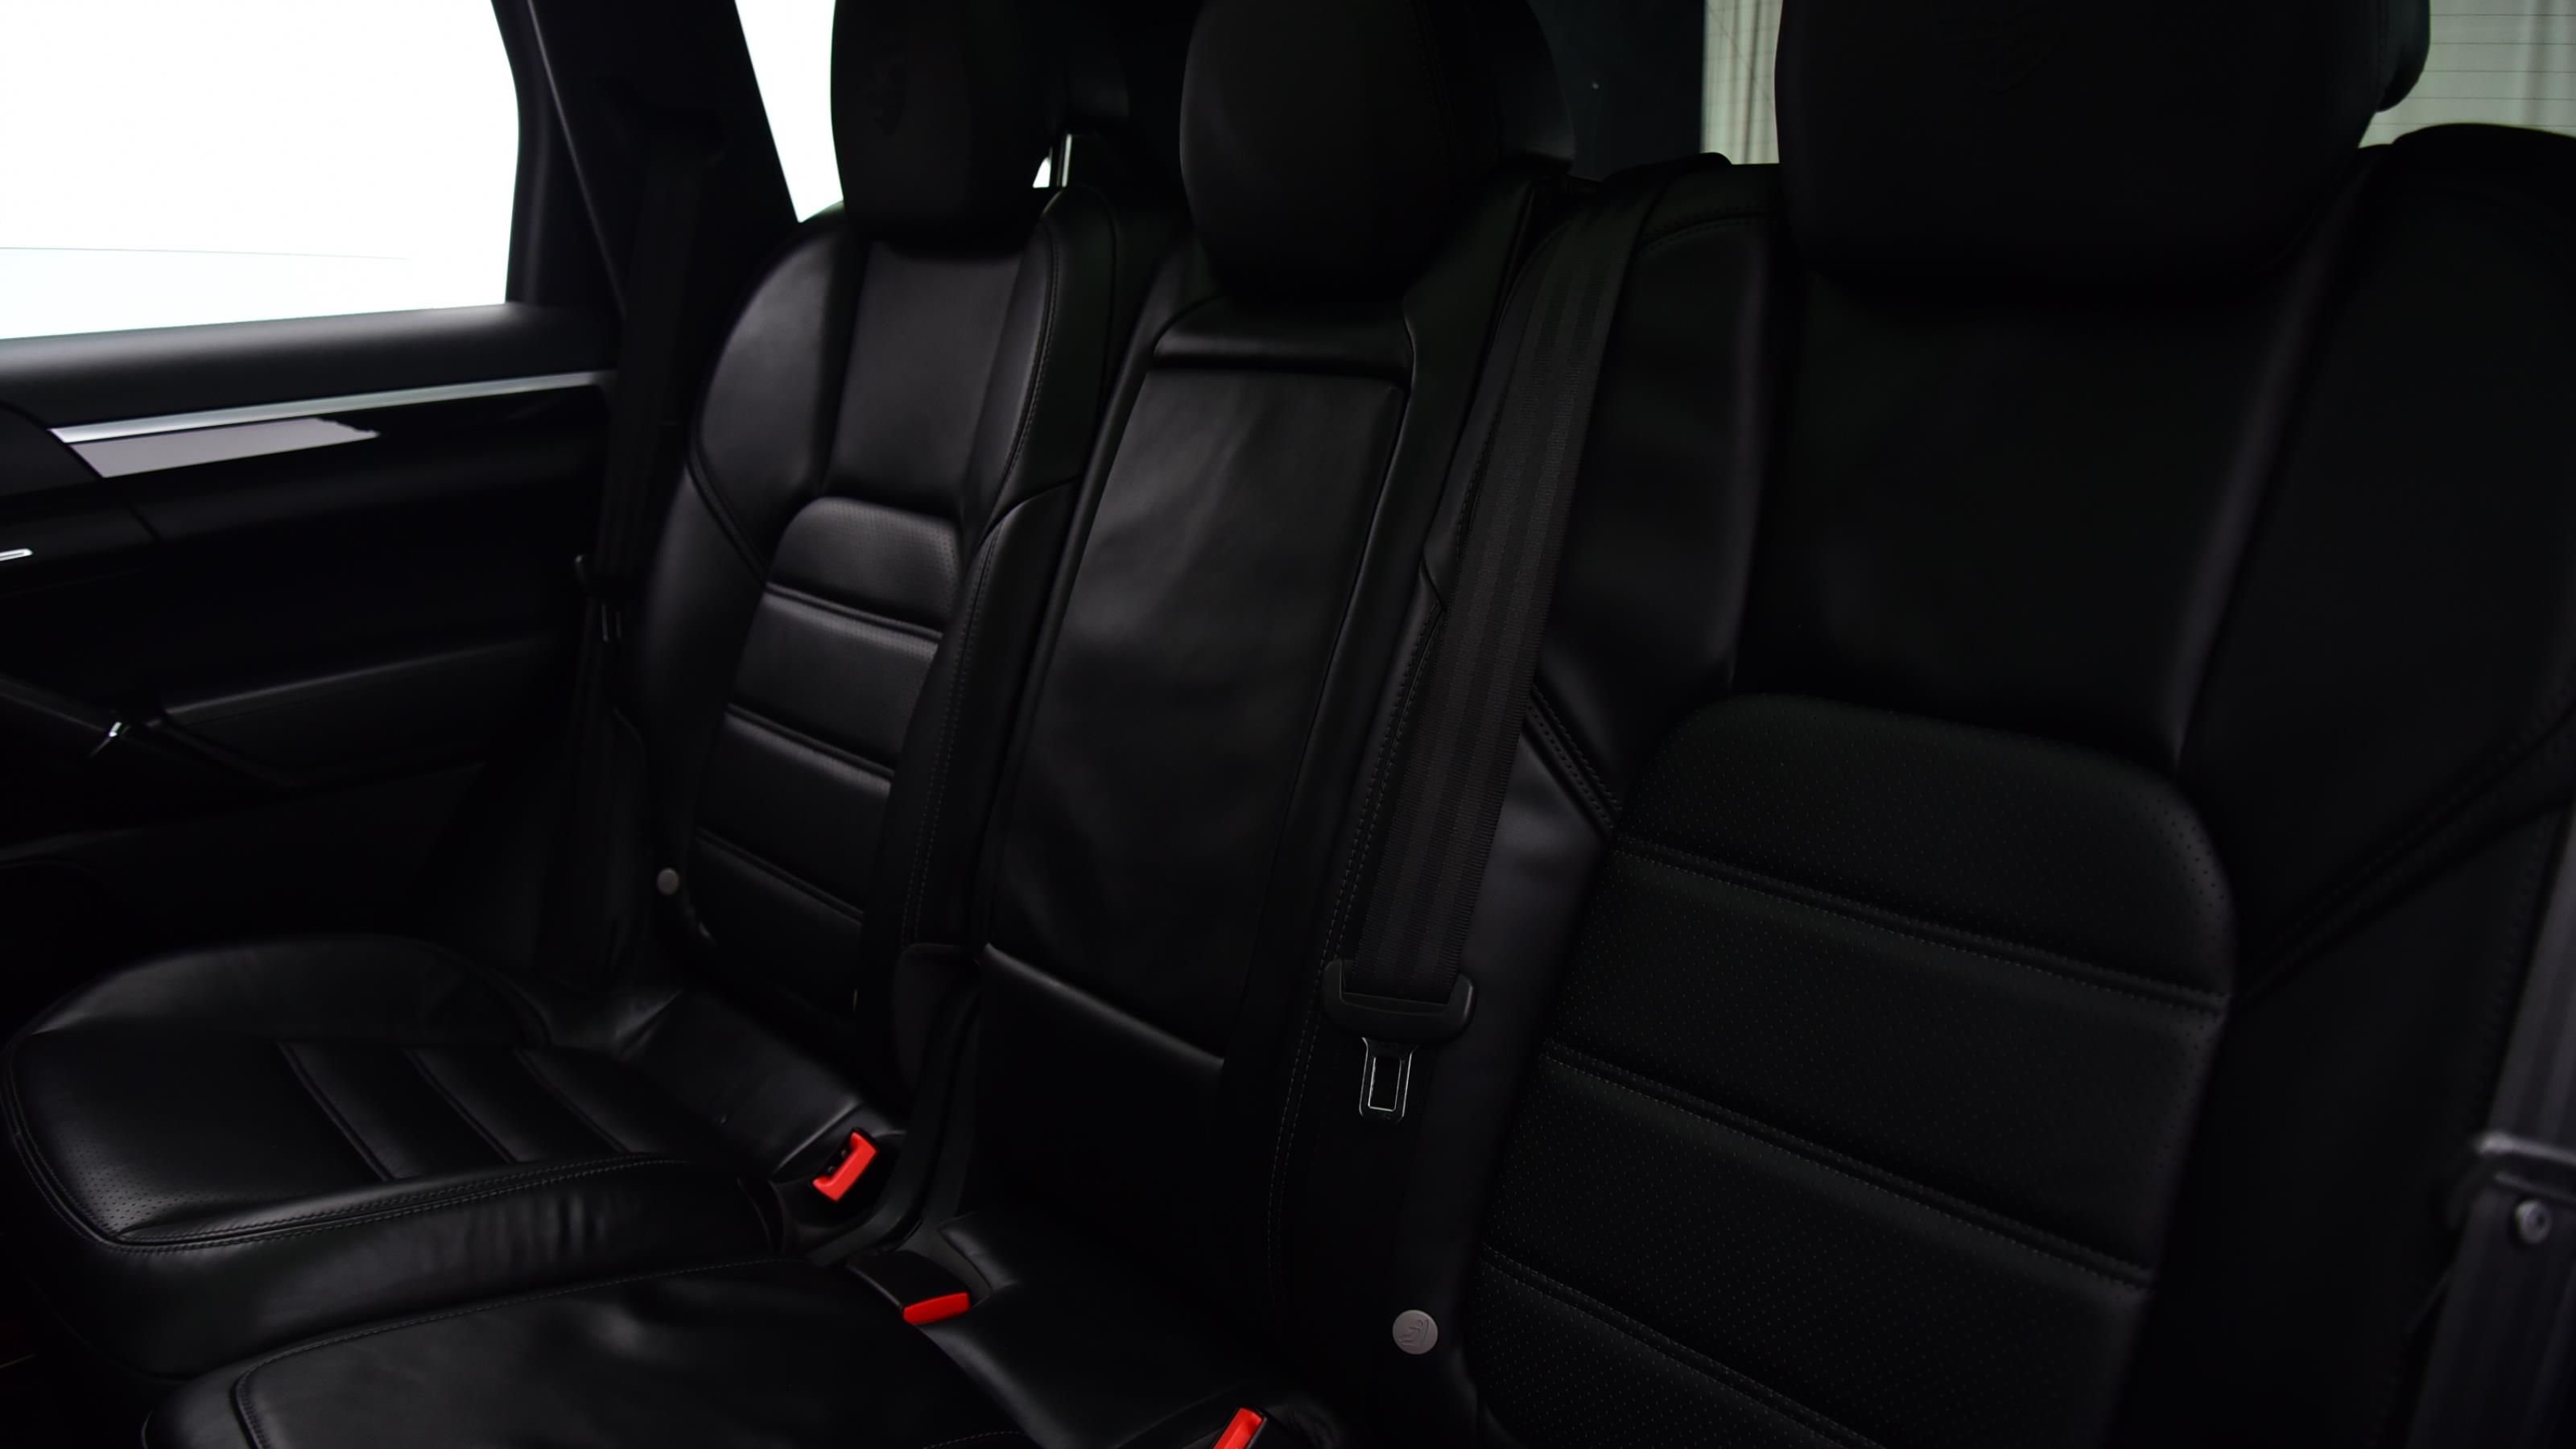 Used 2016 Porsche CAYENNE S Diesel 5dr Tiptronic S WHITE at Saxton4x4